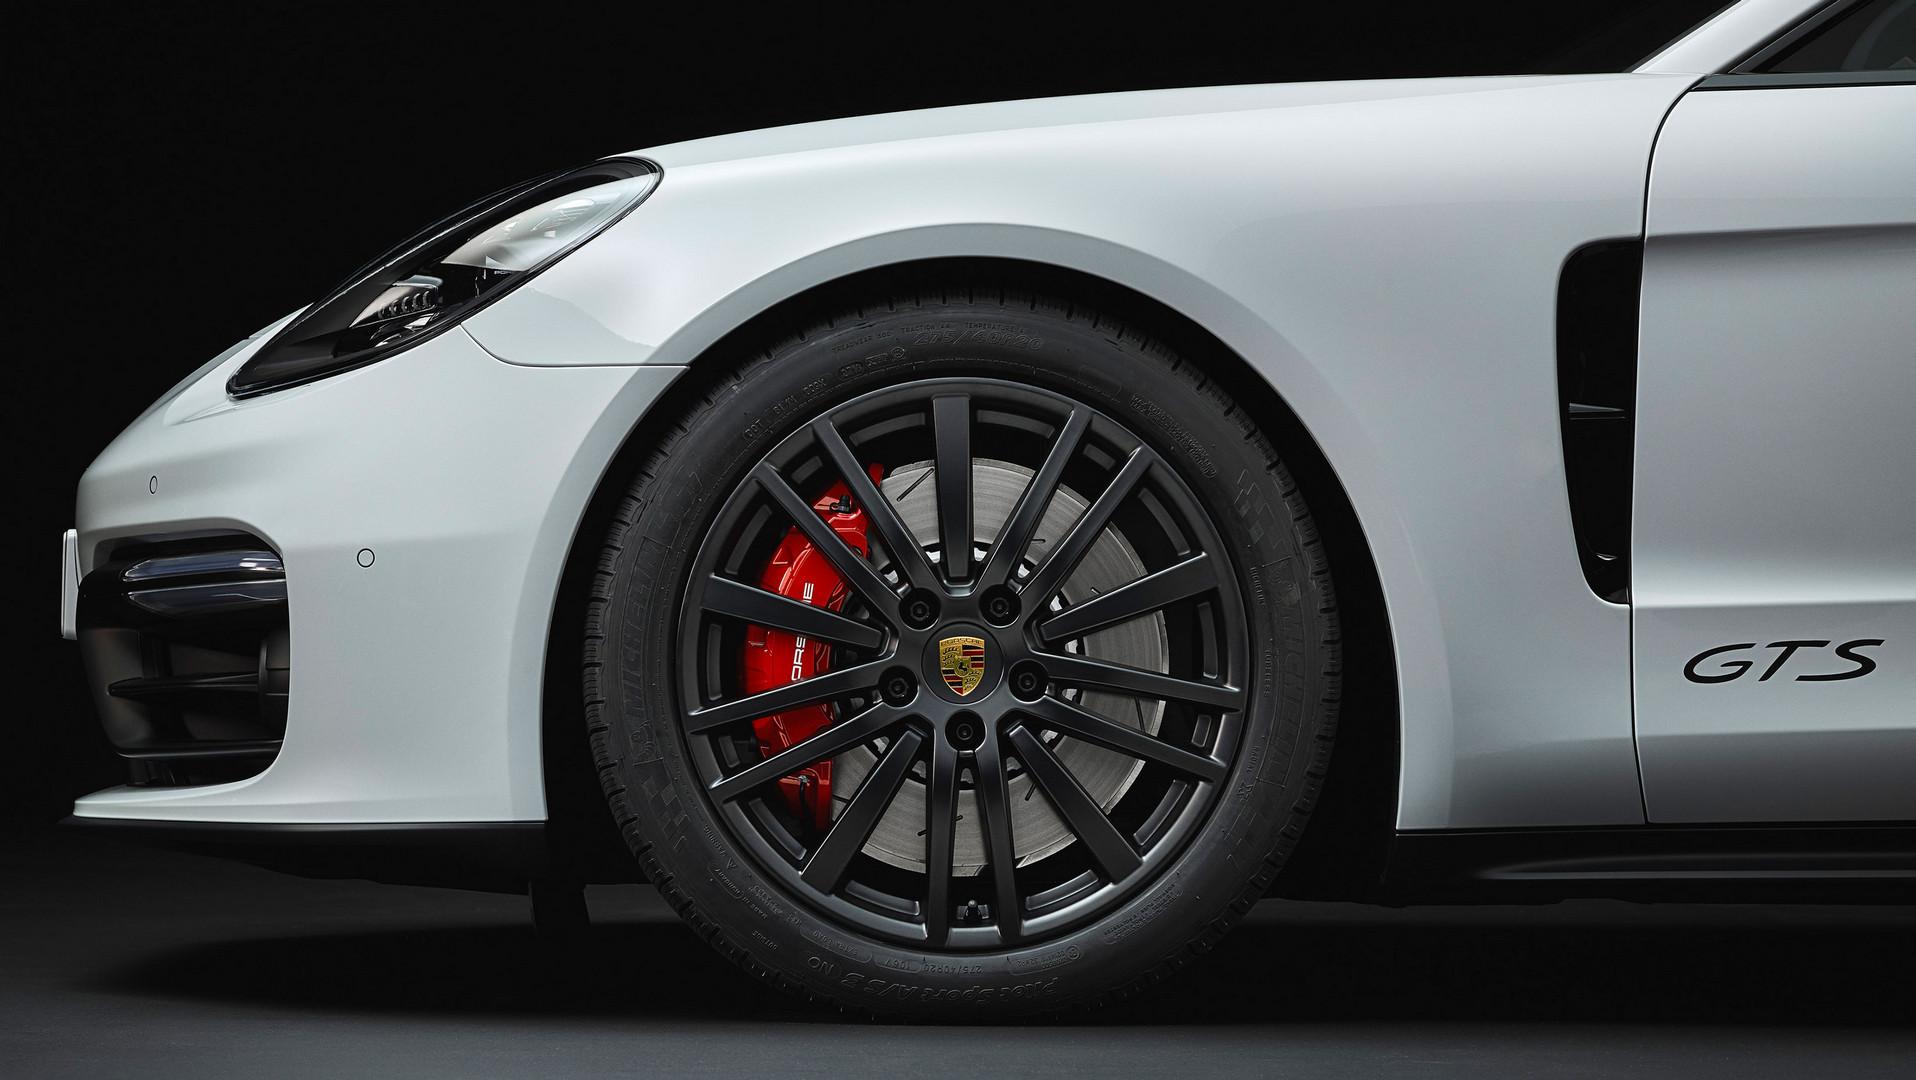 2019 Porsche Panamera GTS Wheel